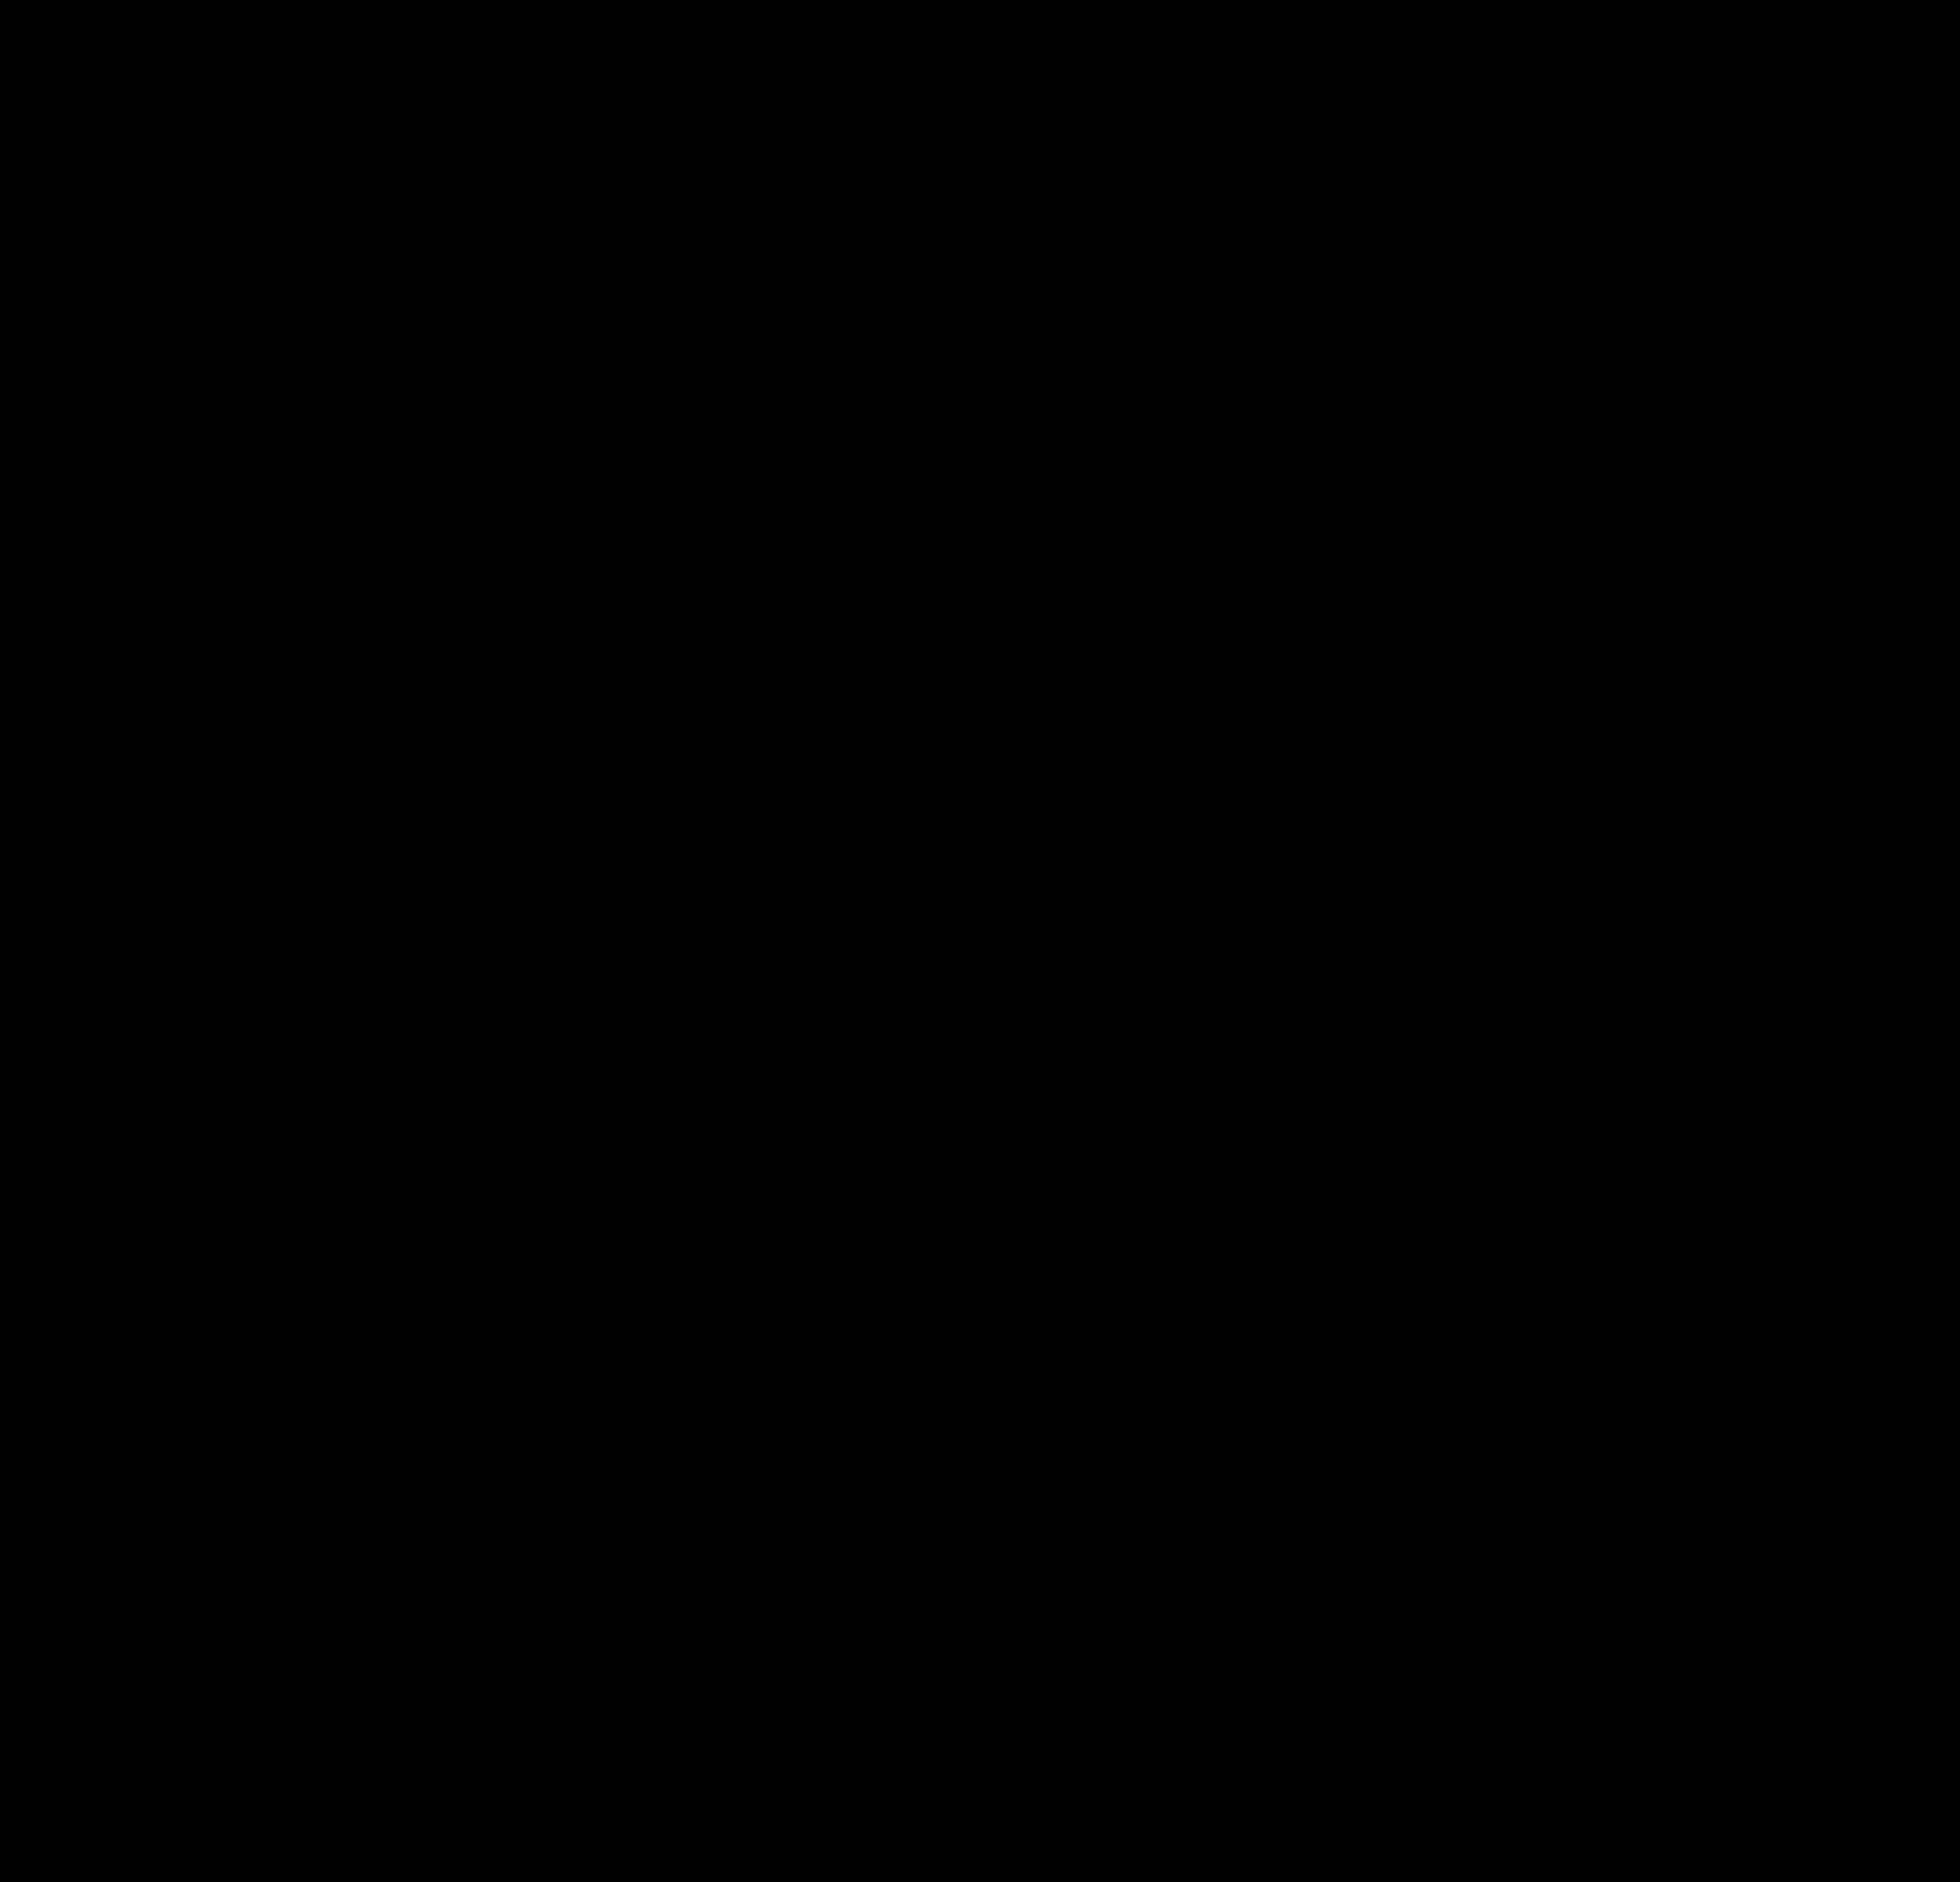 Letter S Clipart Translucent.